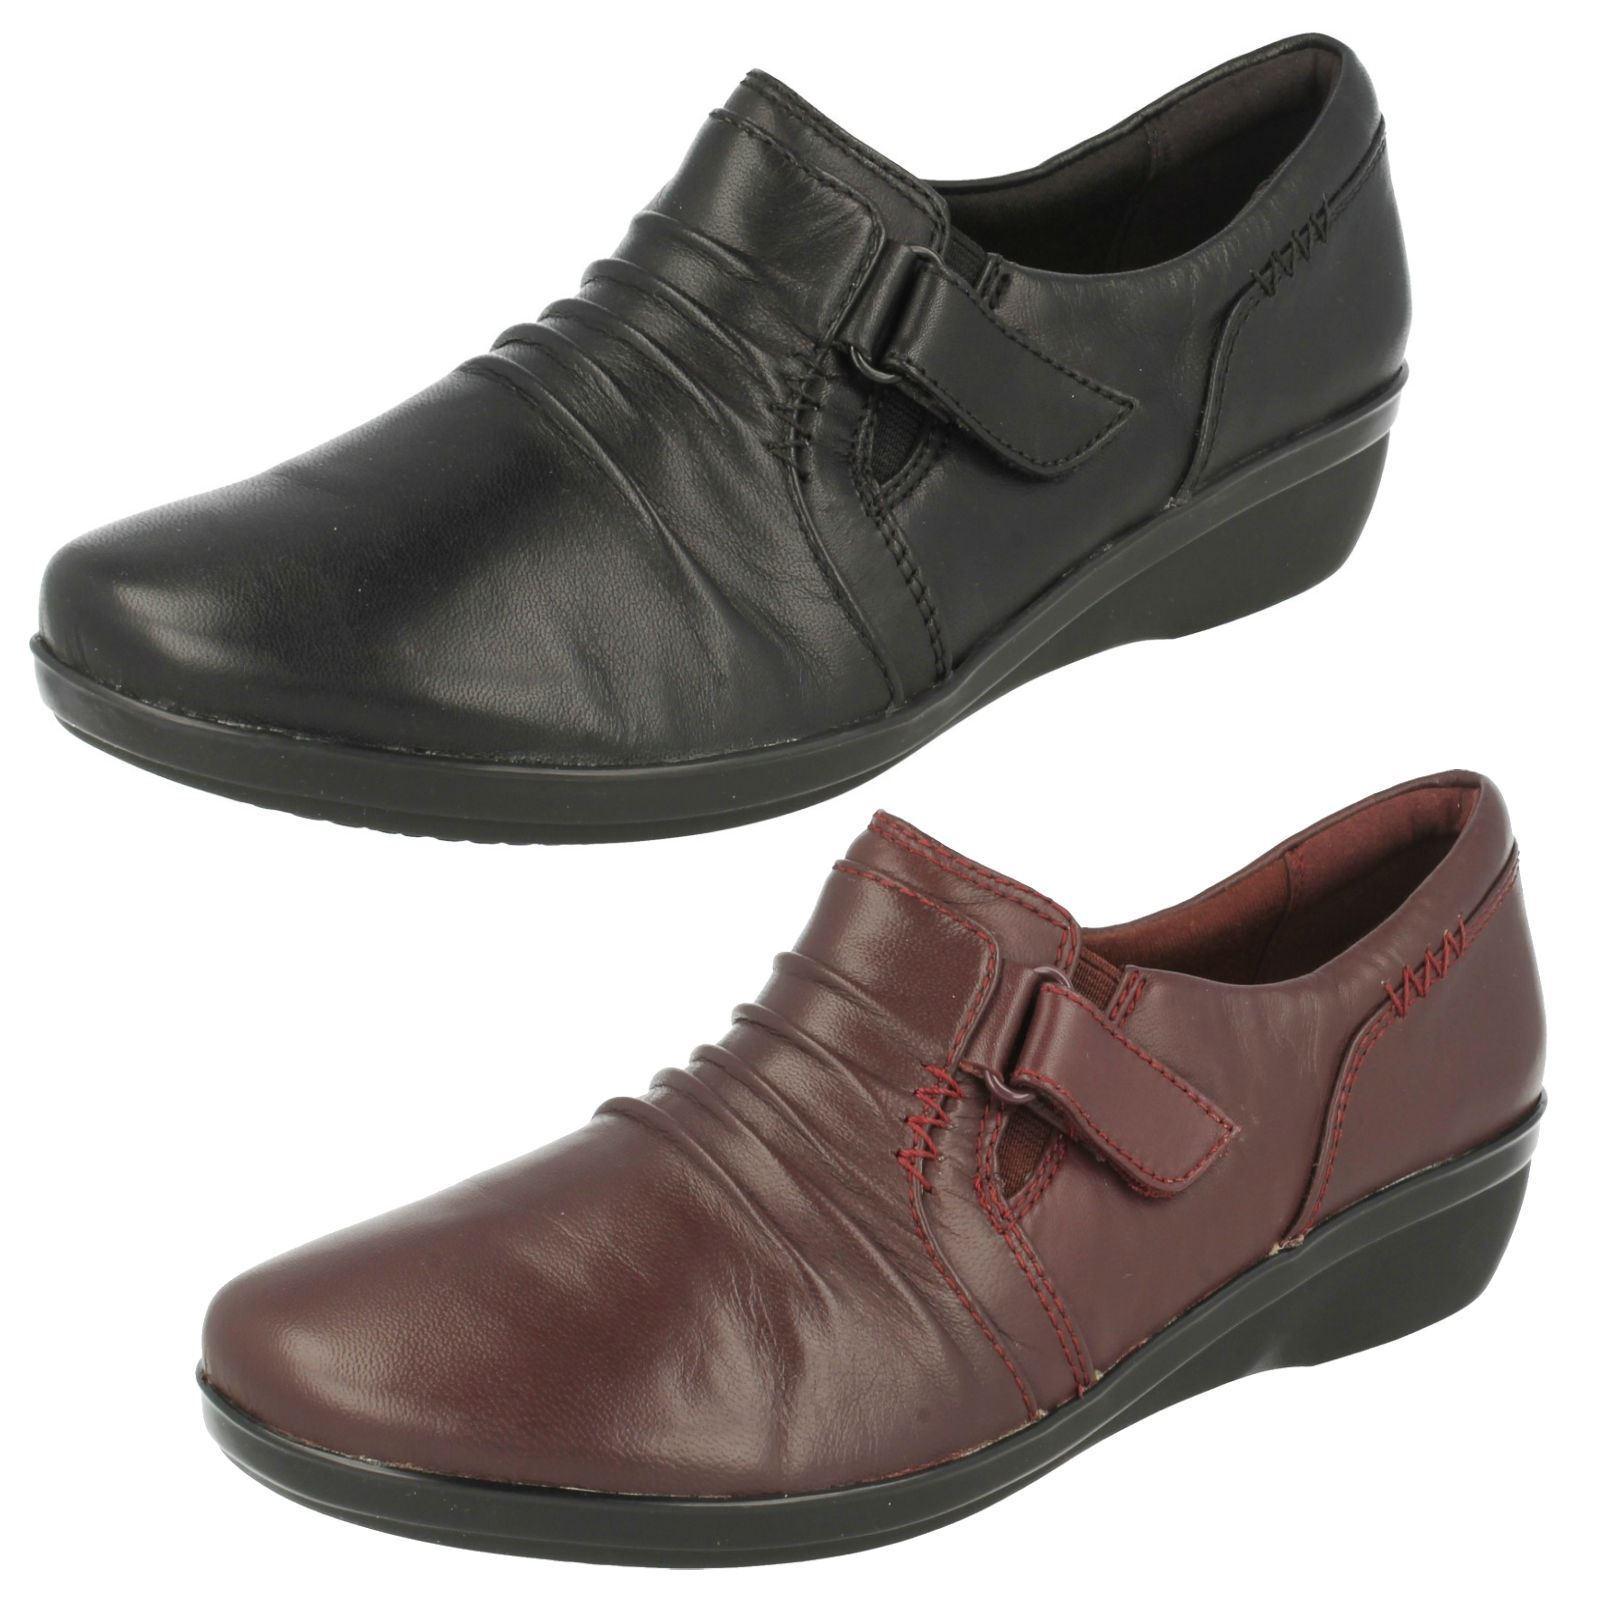 Clarks Femmes Chaussures De Loisirs everlay Coda